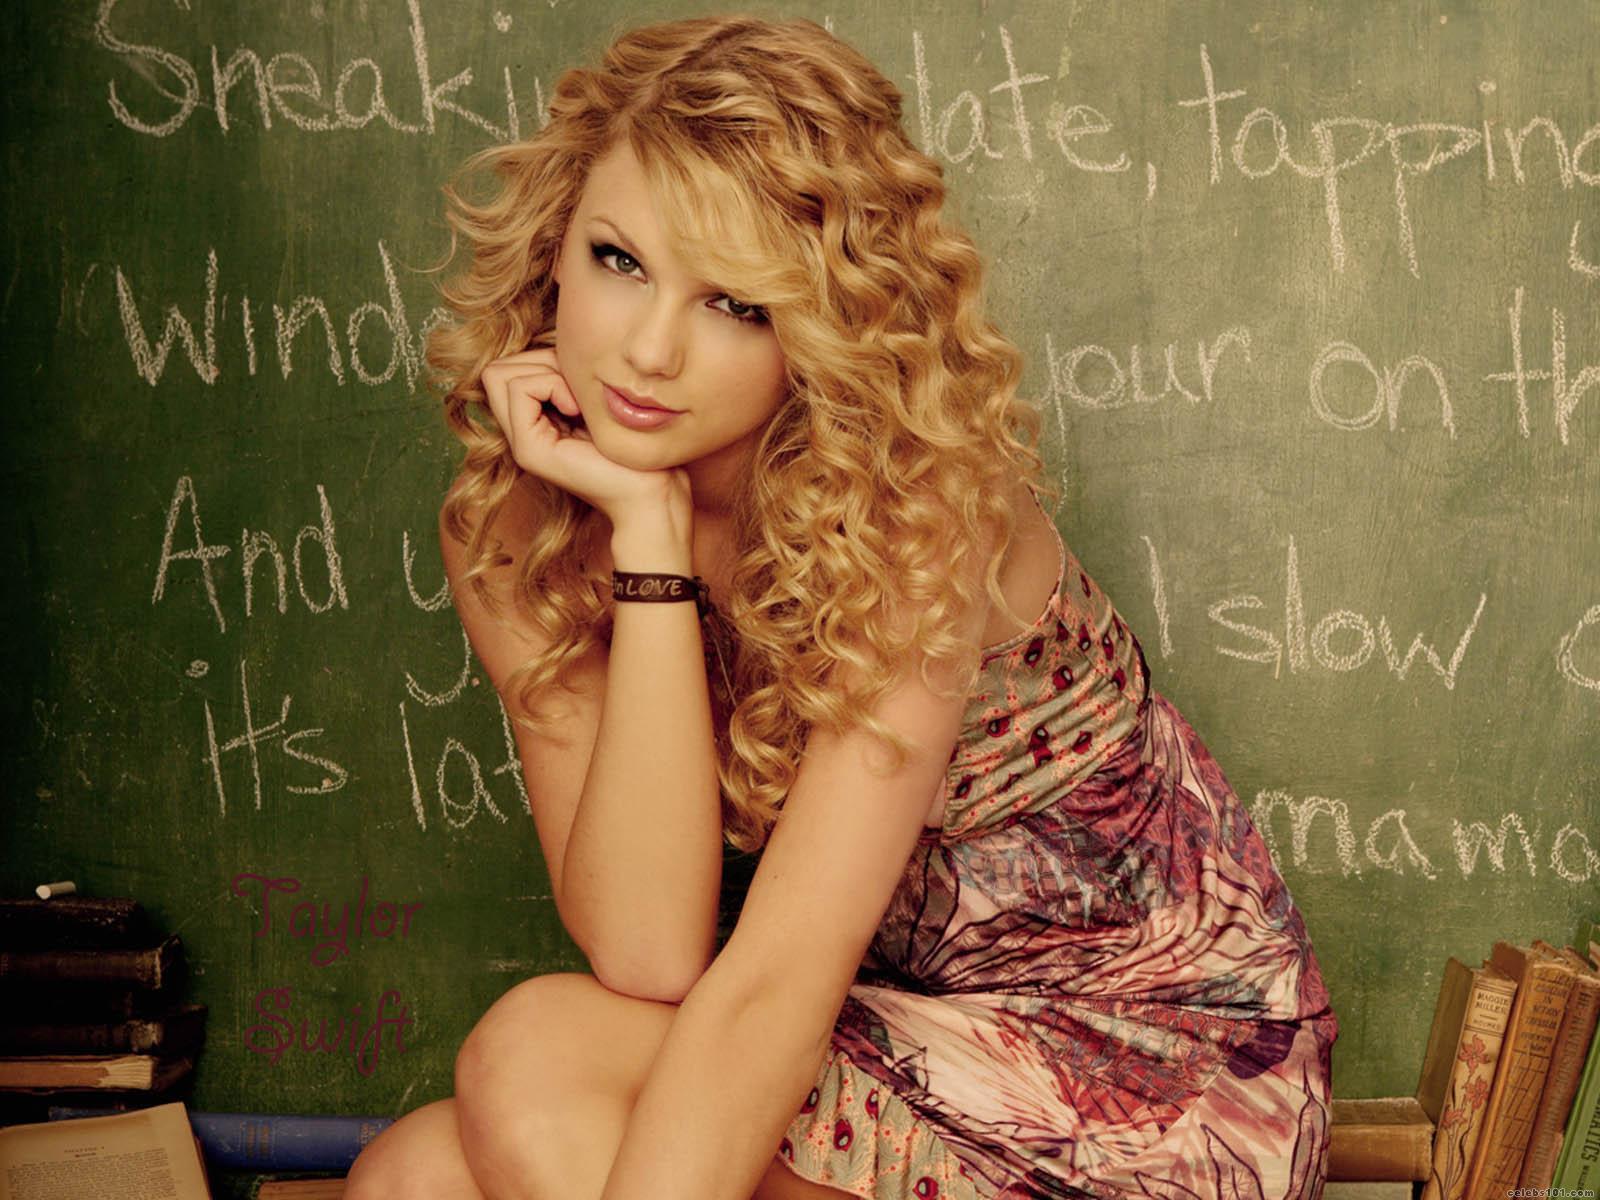 http://4.bp.blogspot.com/-ObkfjFVwFF0/Tg8qkmyYXKI/AAAAAAAAKkM/7eVTMOMUtDI/s1600/Taylor_Swift_Wallpaper18.jpg